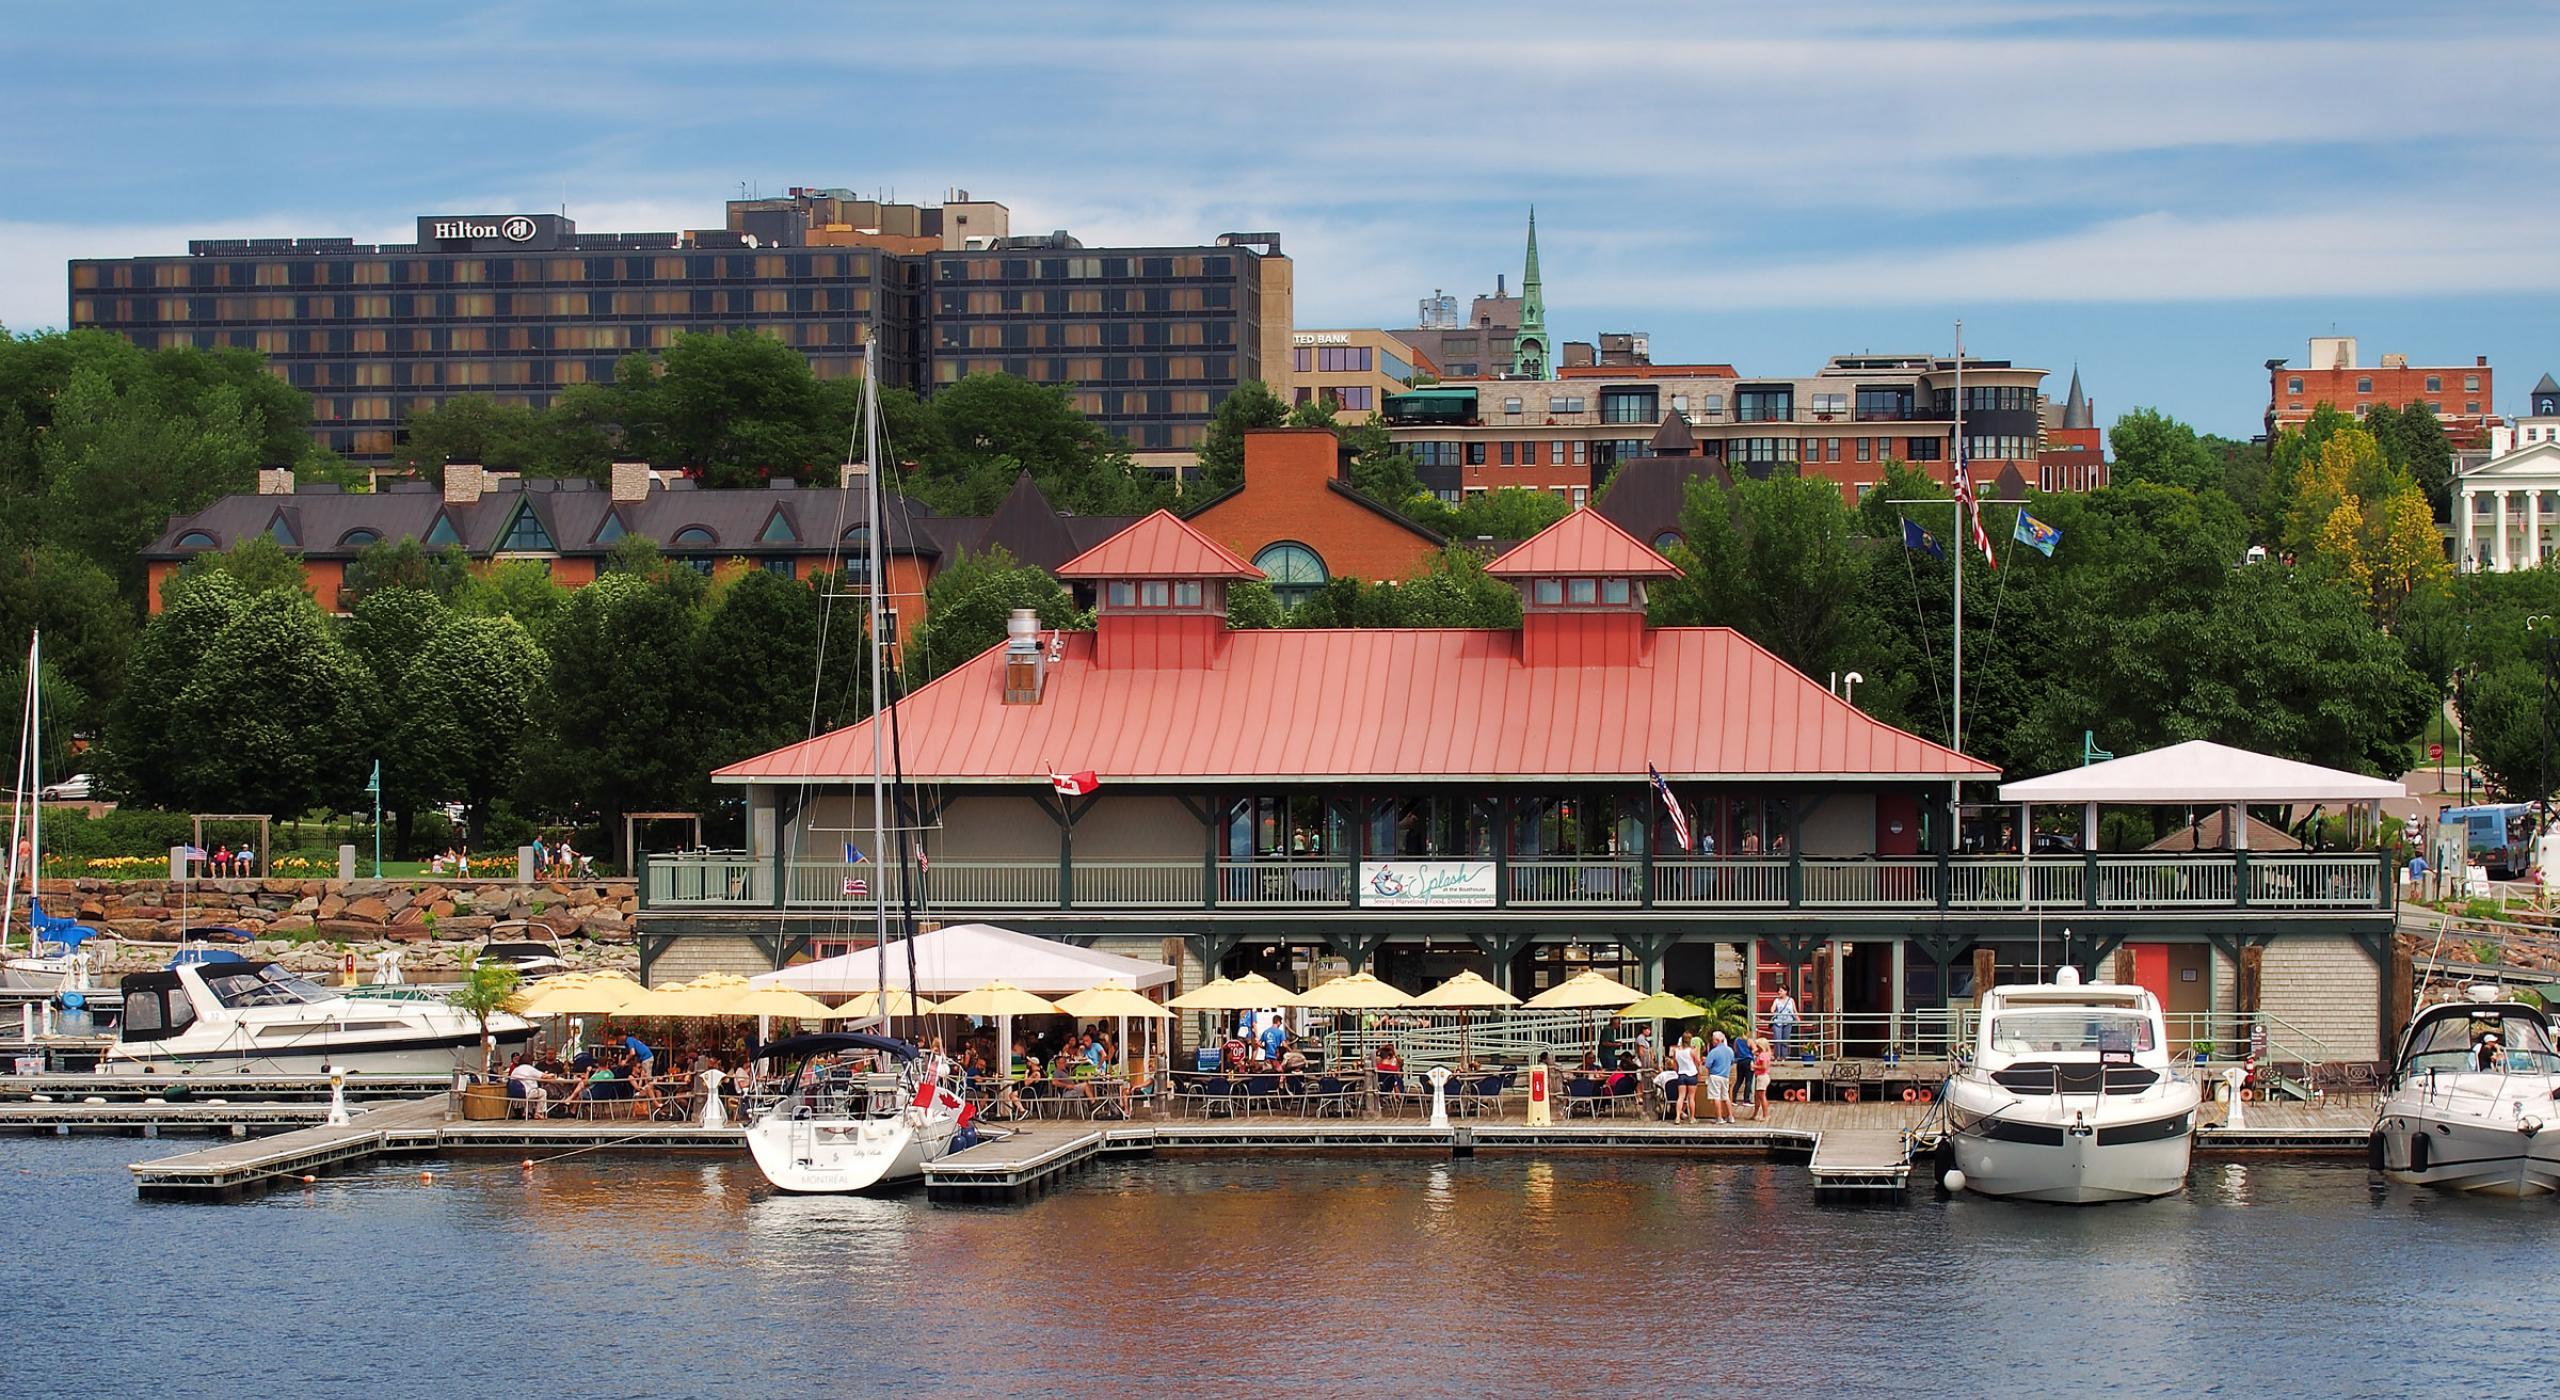 burlington vermont tourism university and lake attractions burlington vermont tourism